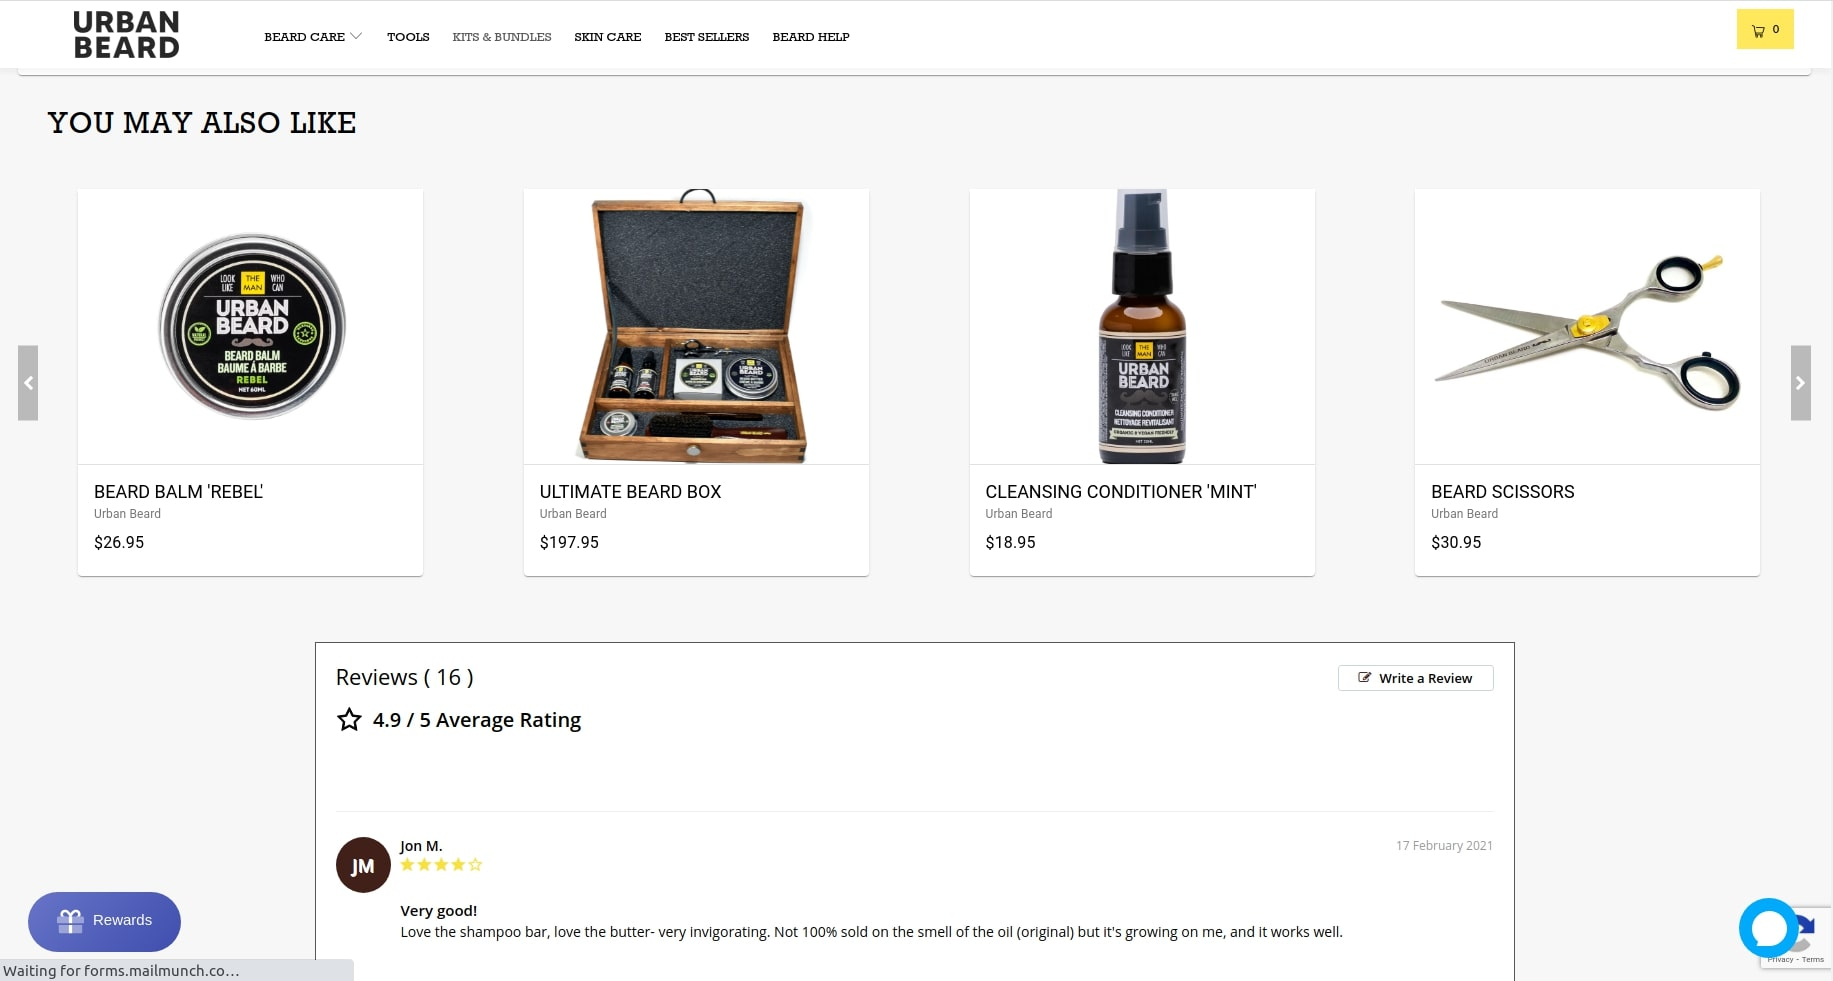 Home Page of Urban Beard Website